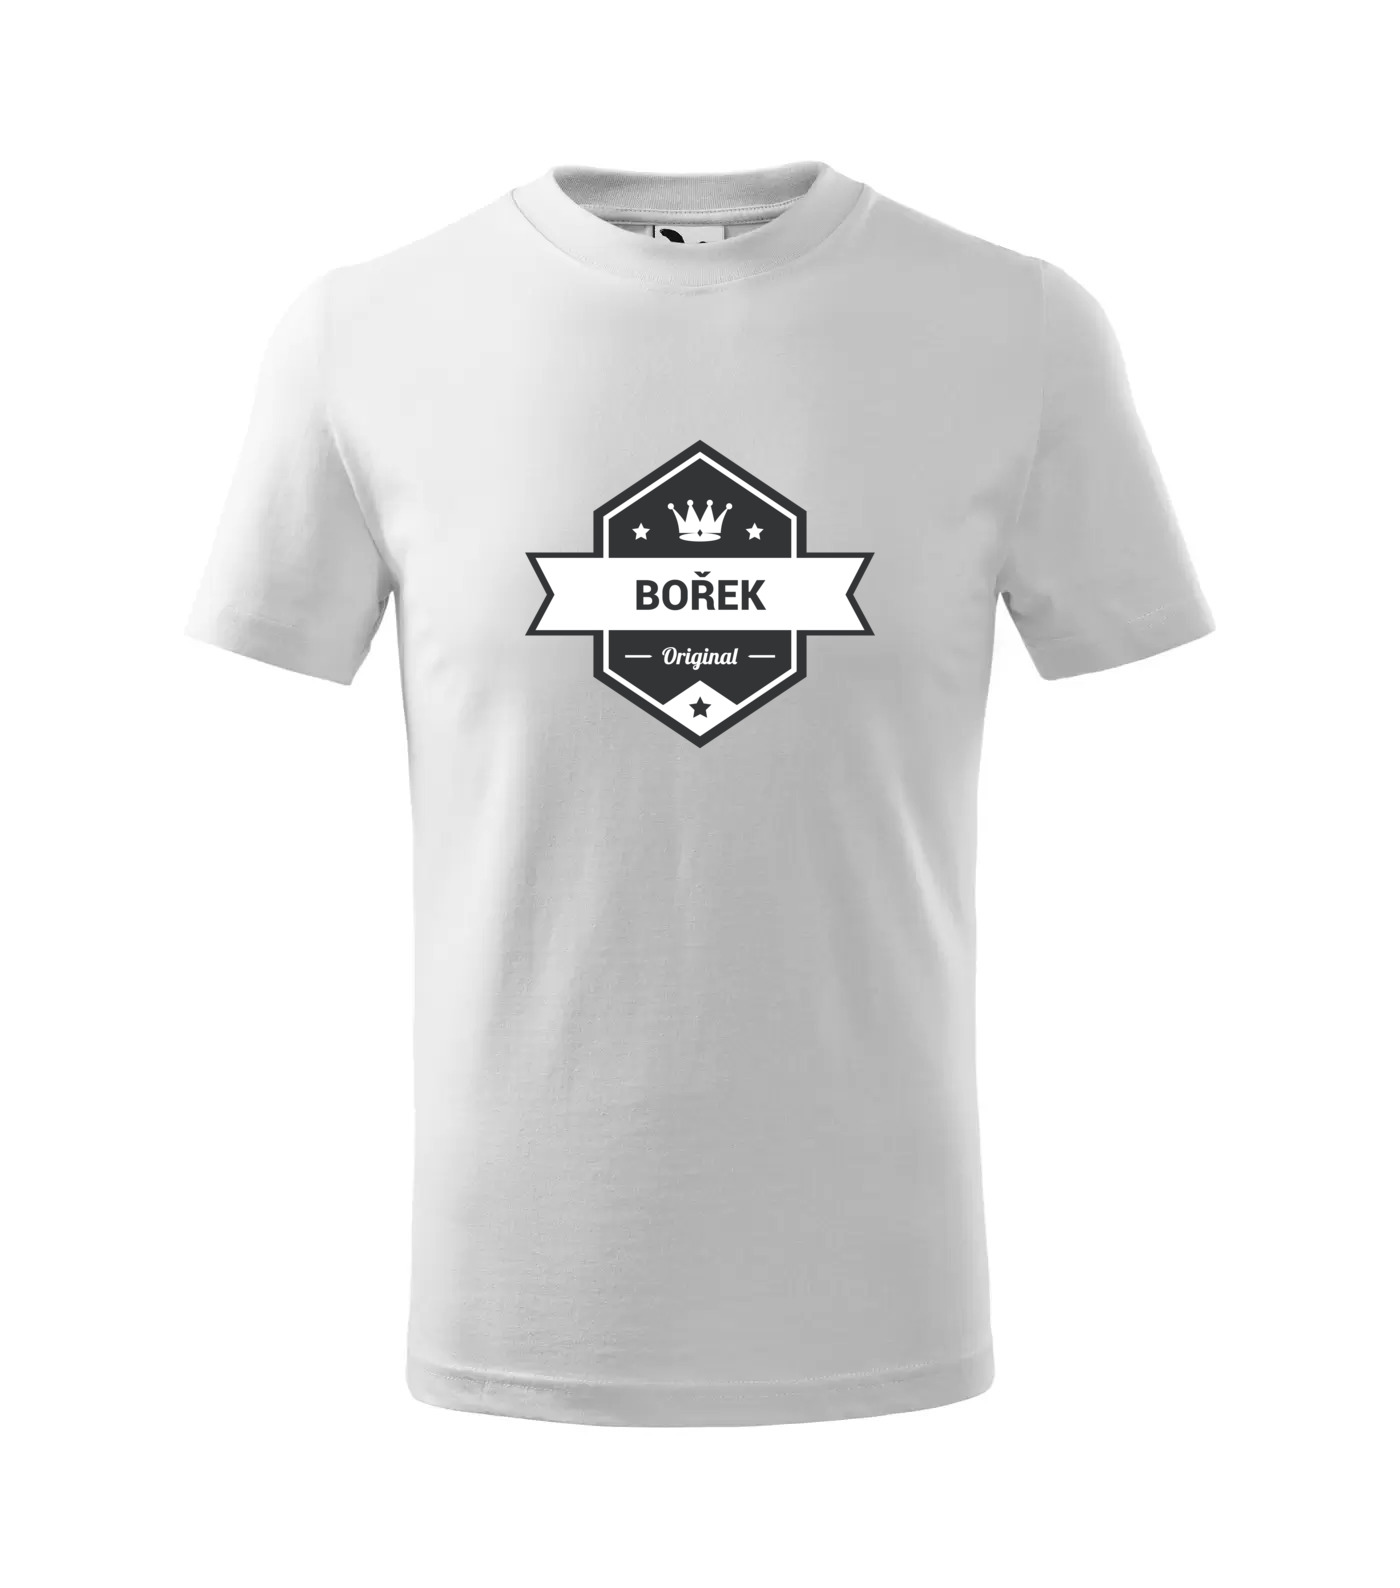 Tričko King Bořek